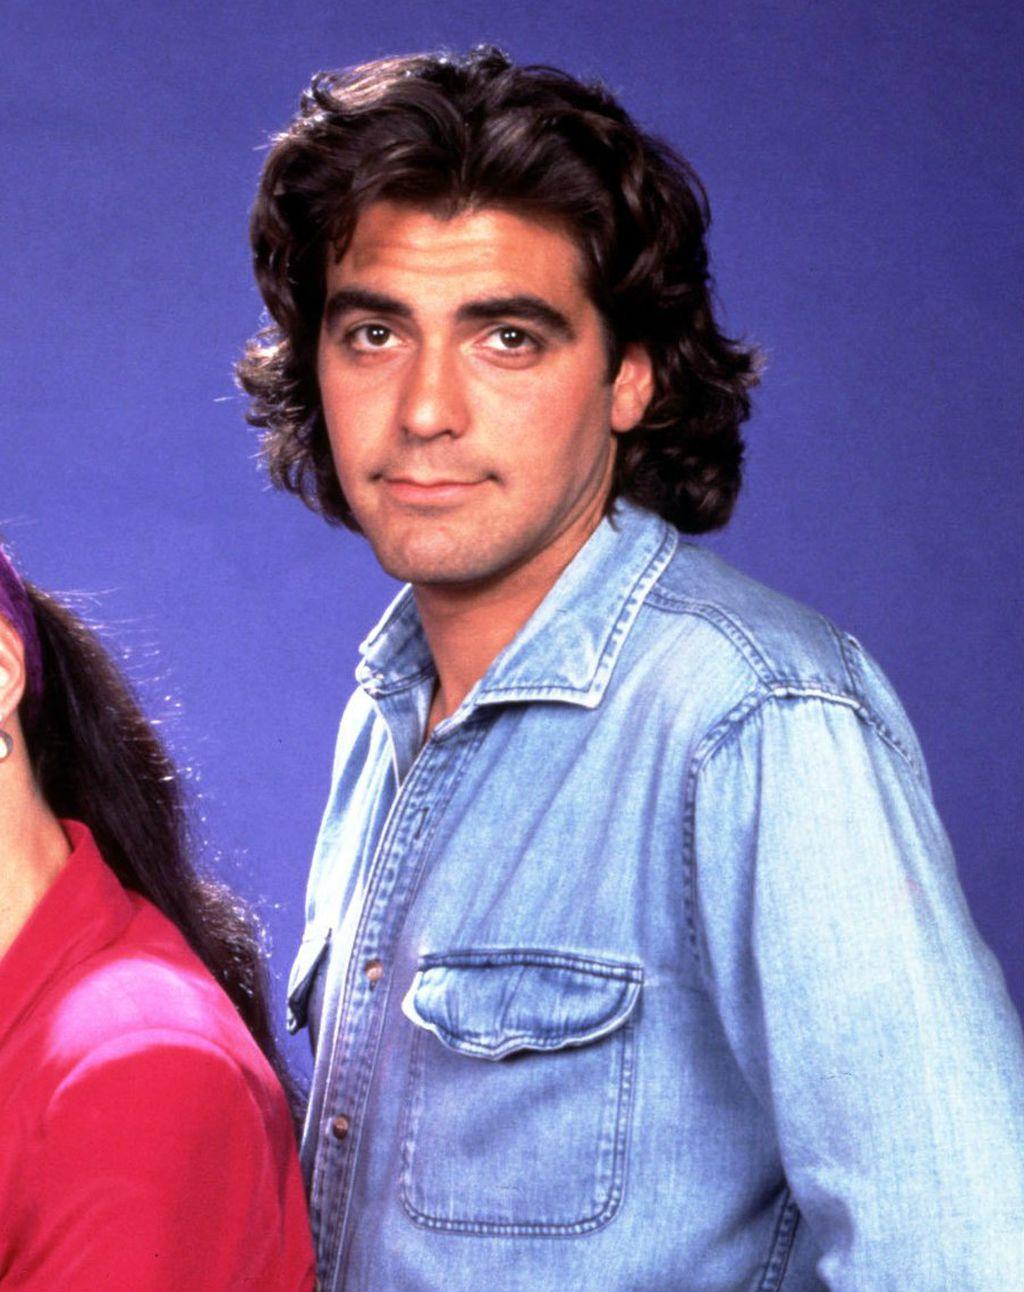 George Clooney na početku karijere